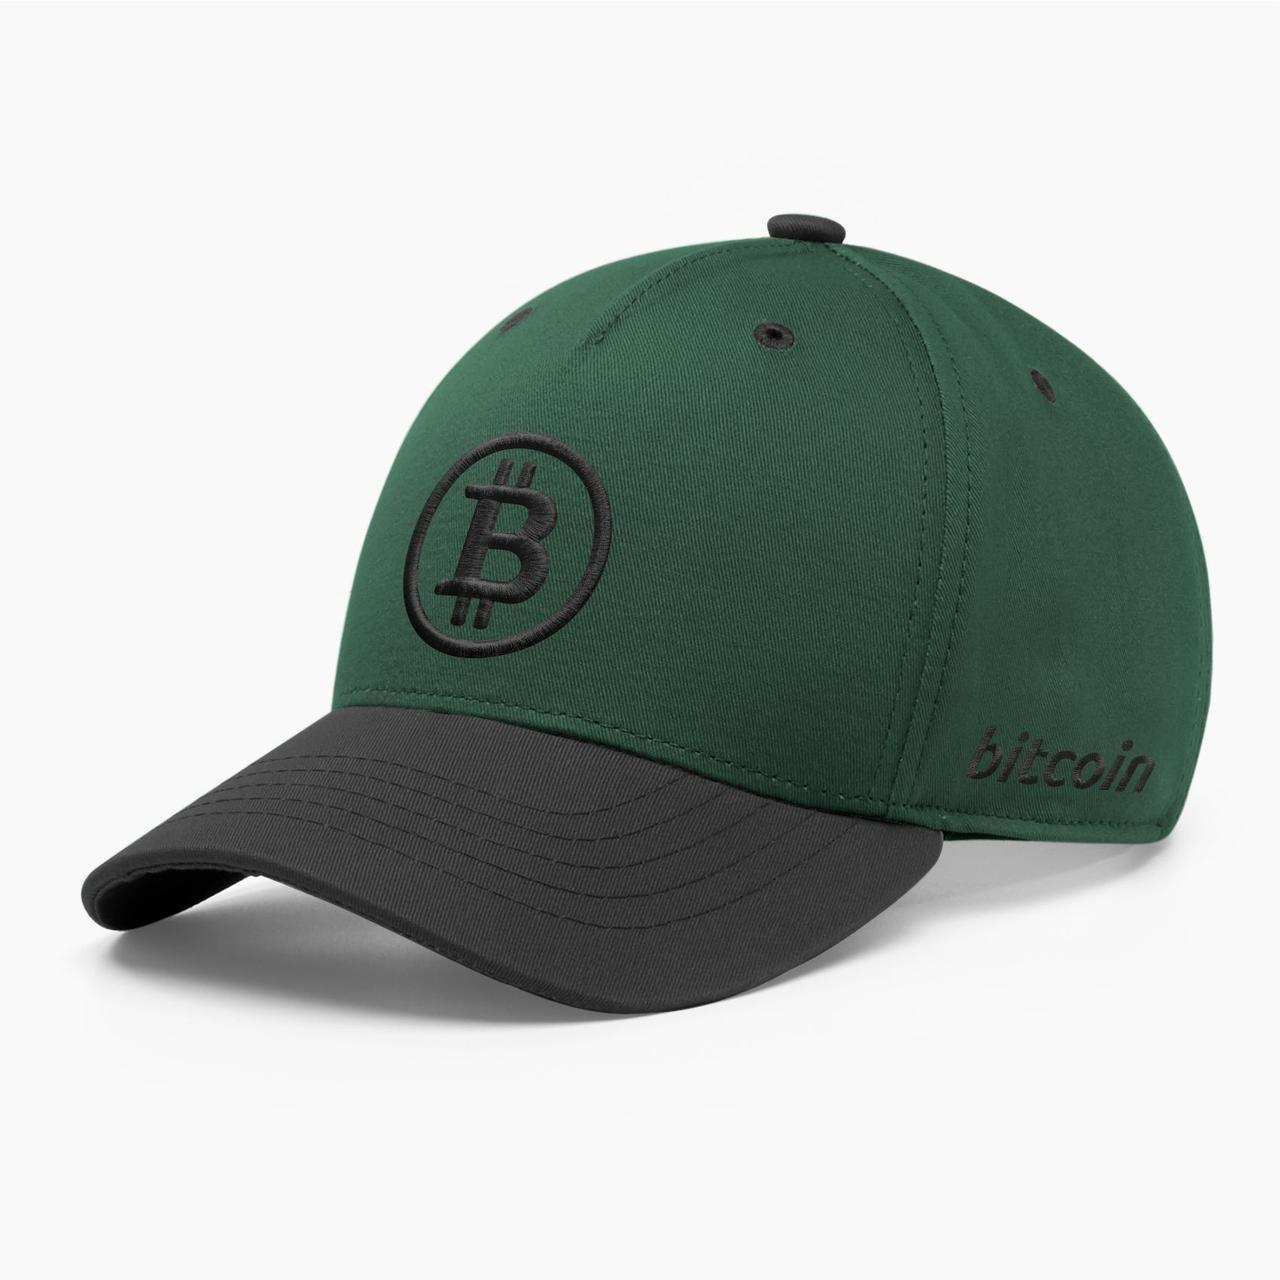 Кепка бейсболка INAL Биткоин Bitcoin BTC S / 53-54 RU Зеленый 15453